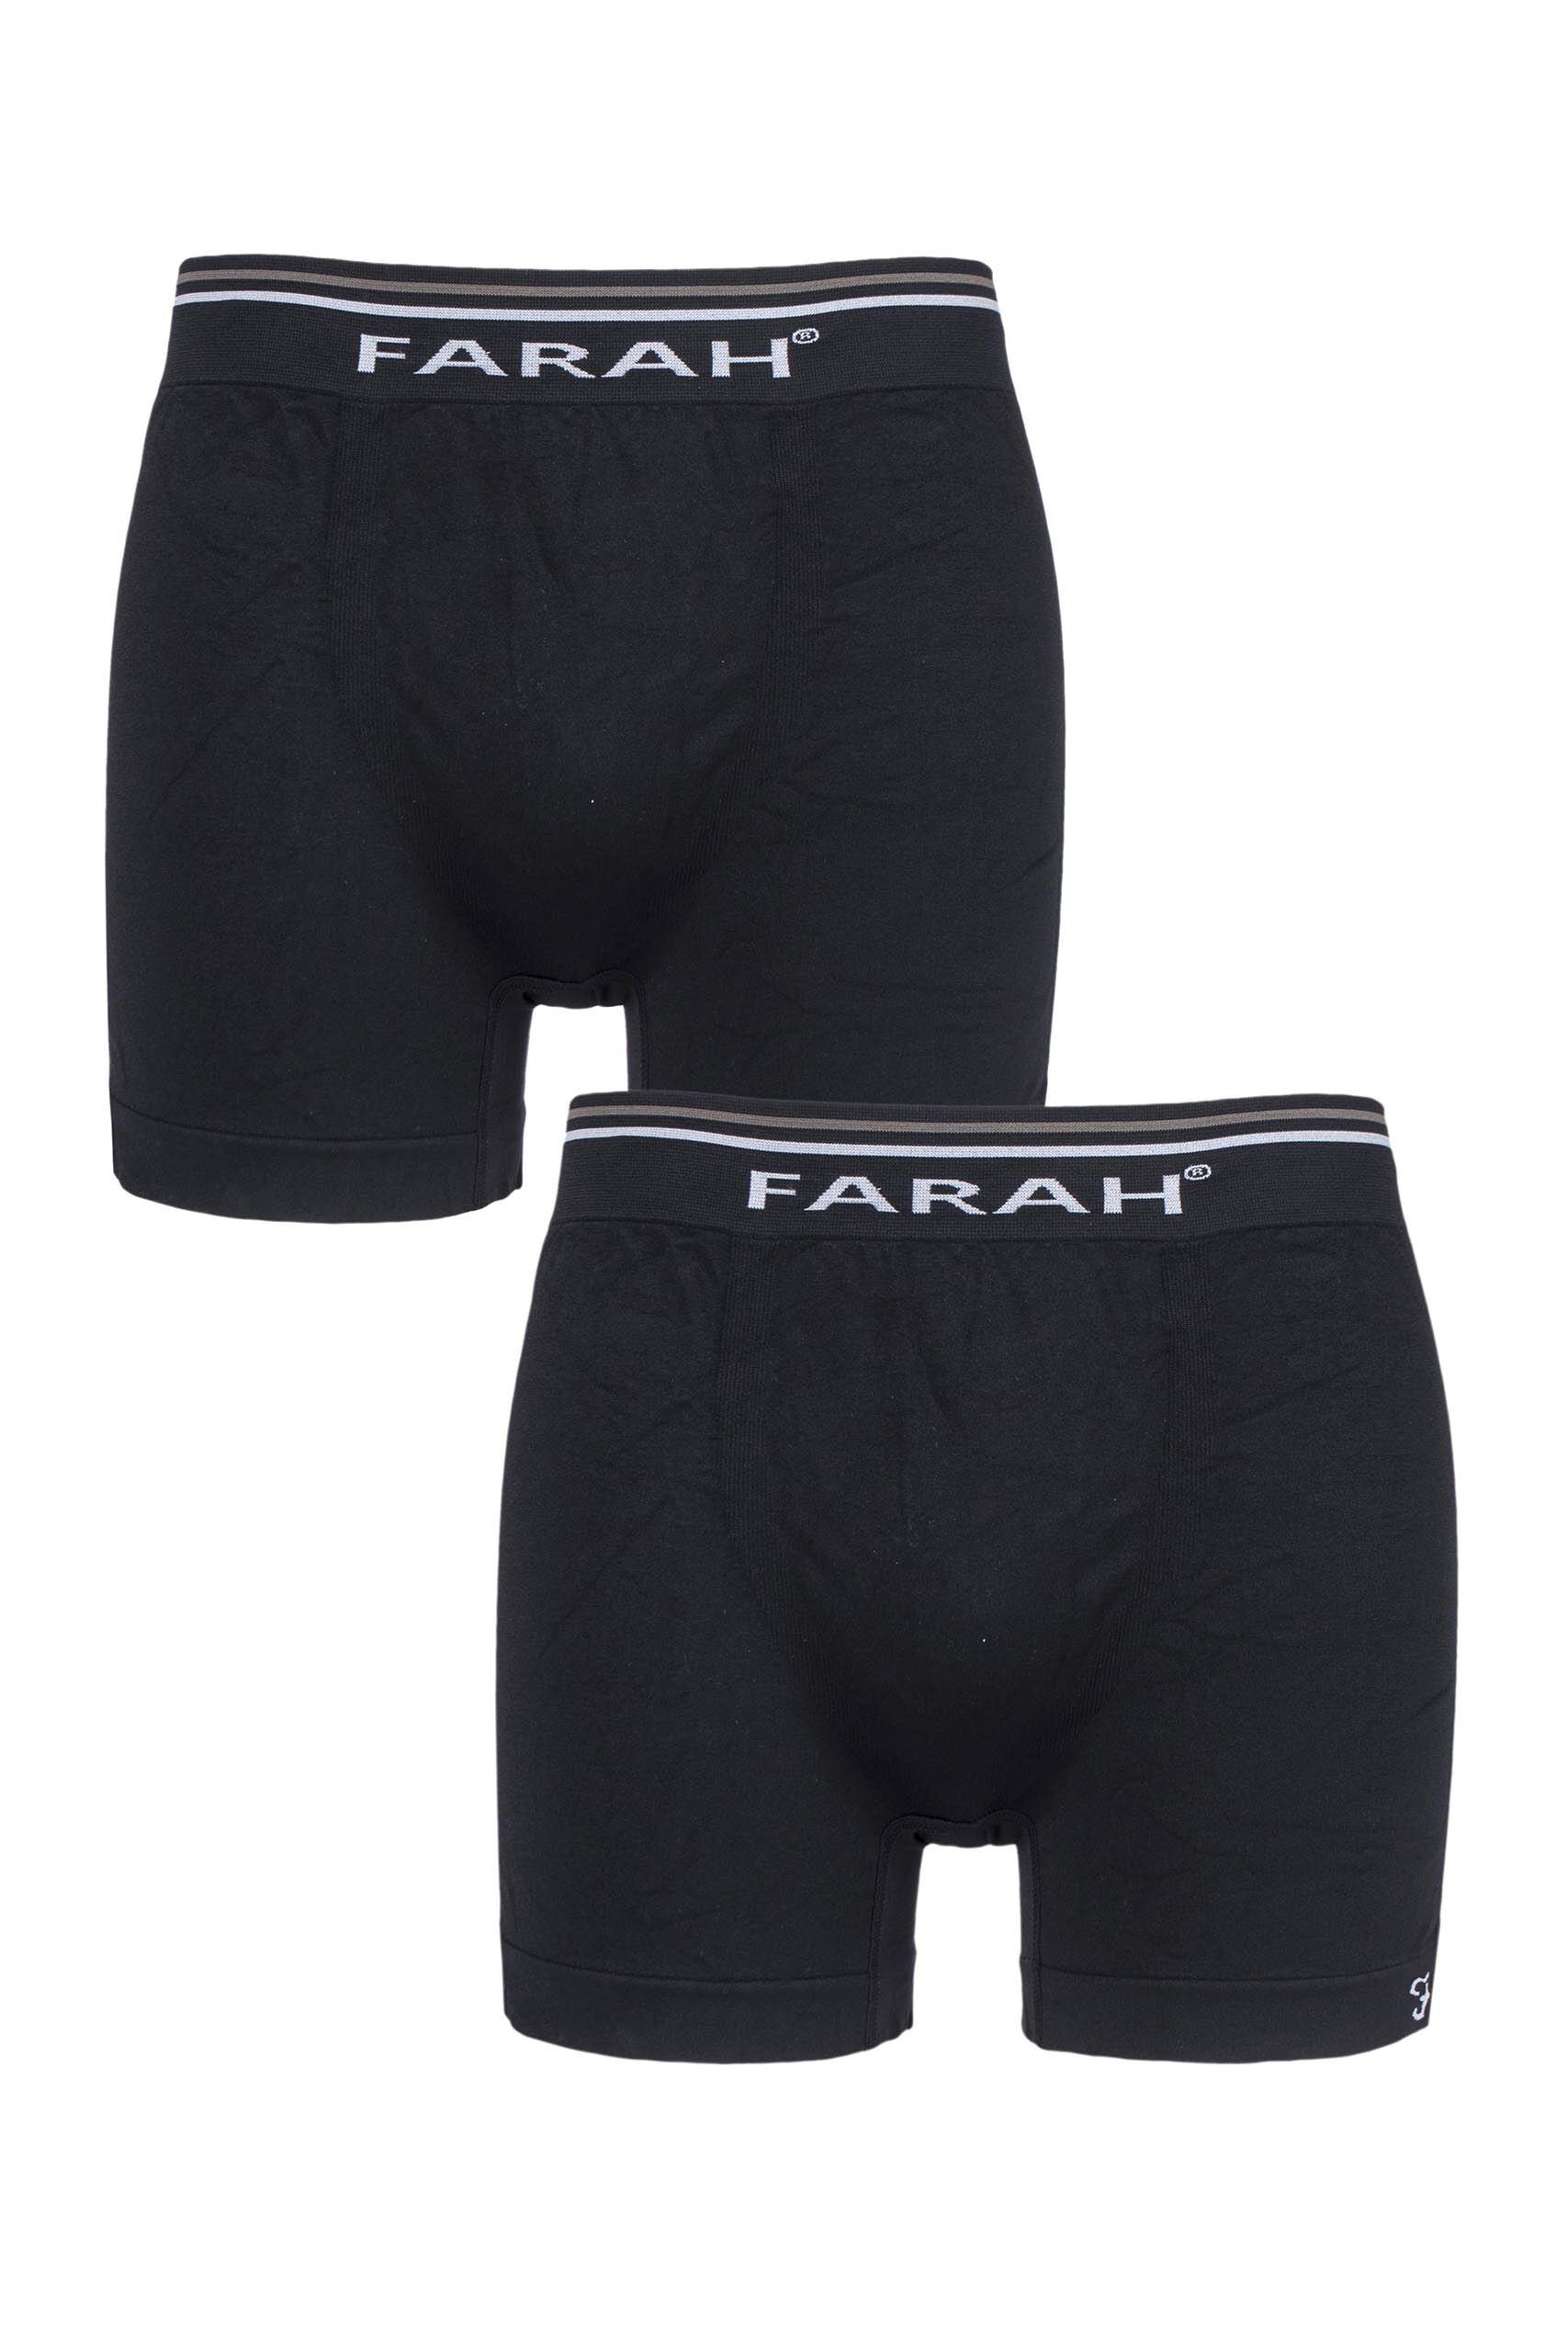 Image of 2 Pack Black Seamless Boxer Shorts Men's Extra Large - Farah